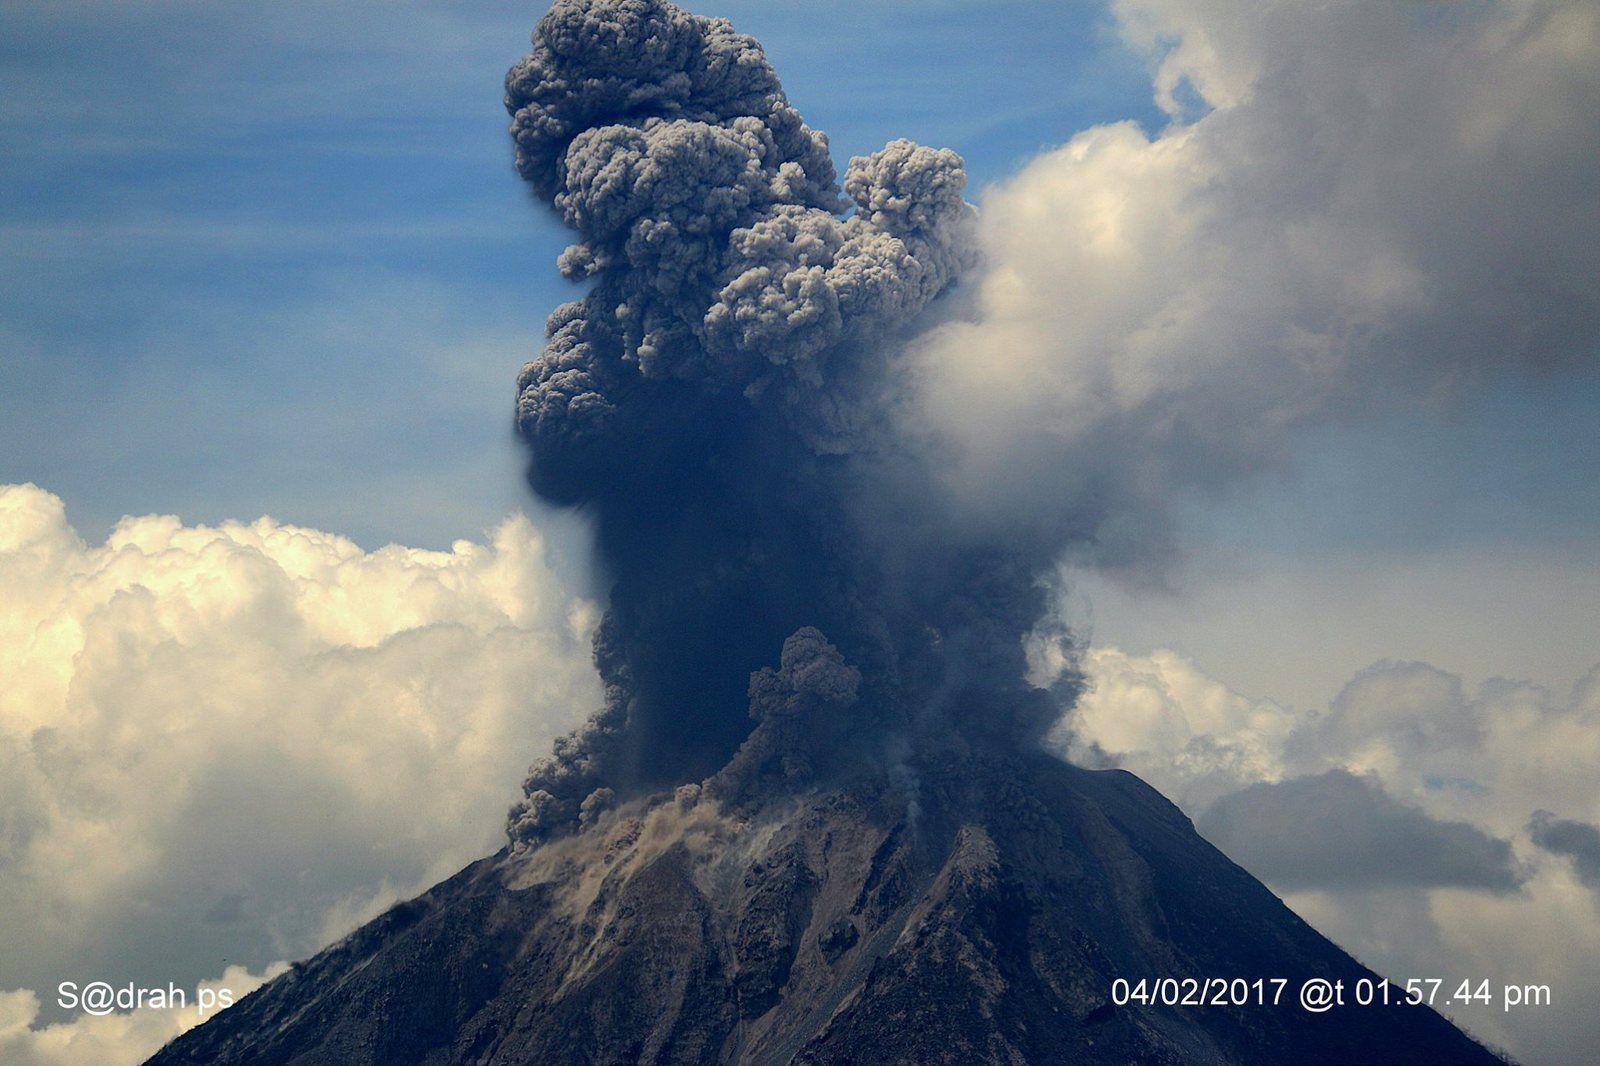 Sinabung - 04.02.2017 / 13h57 - photo Sadrah Peranginangin